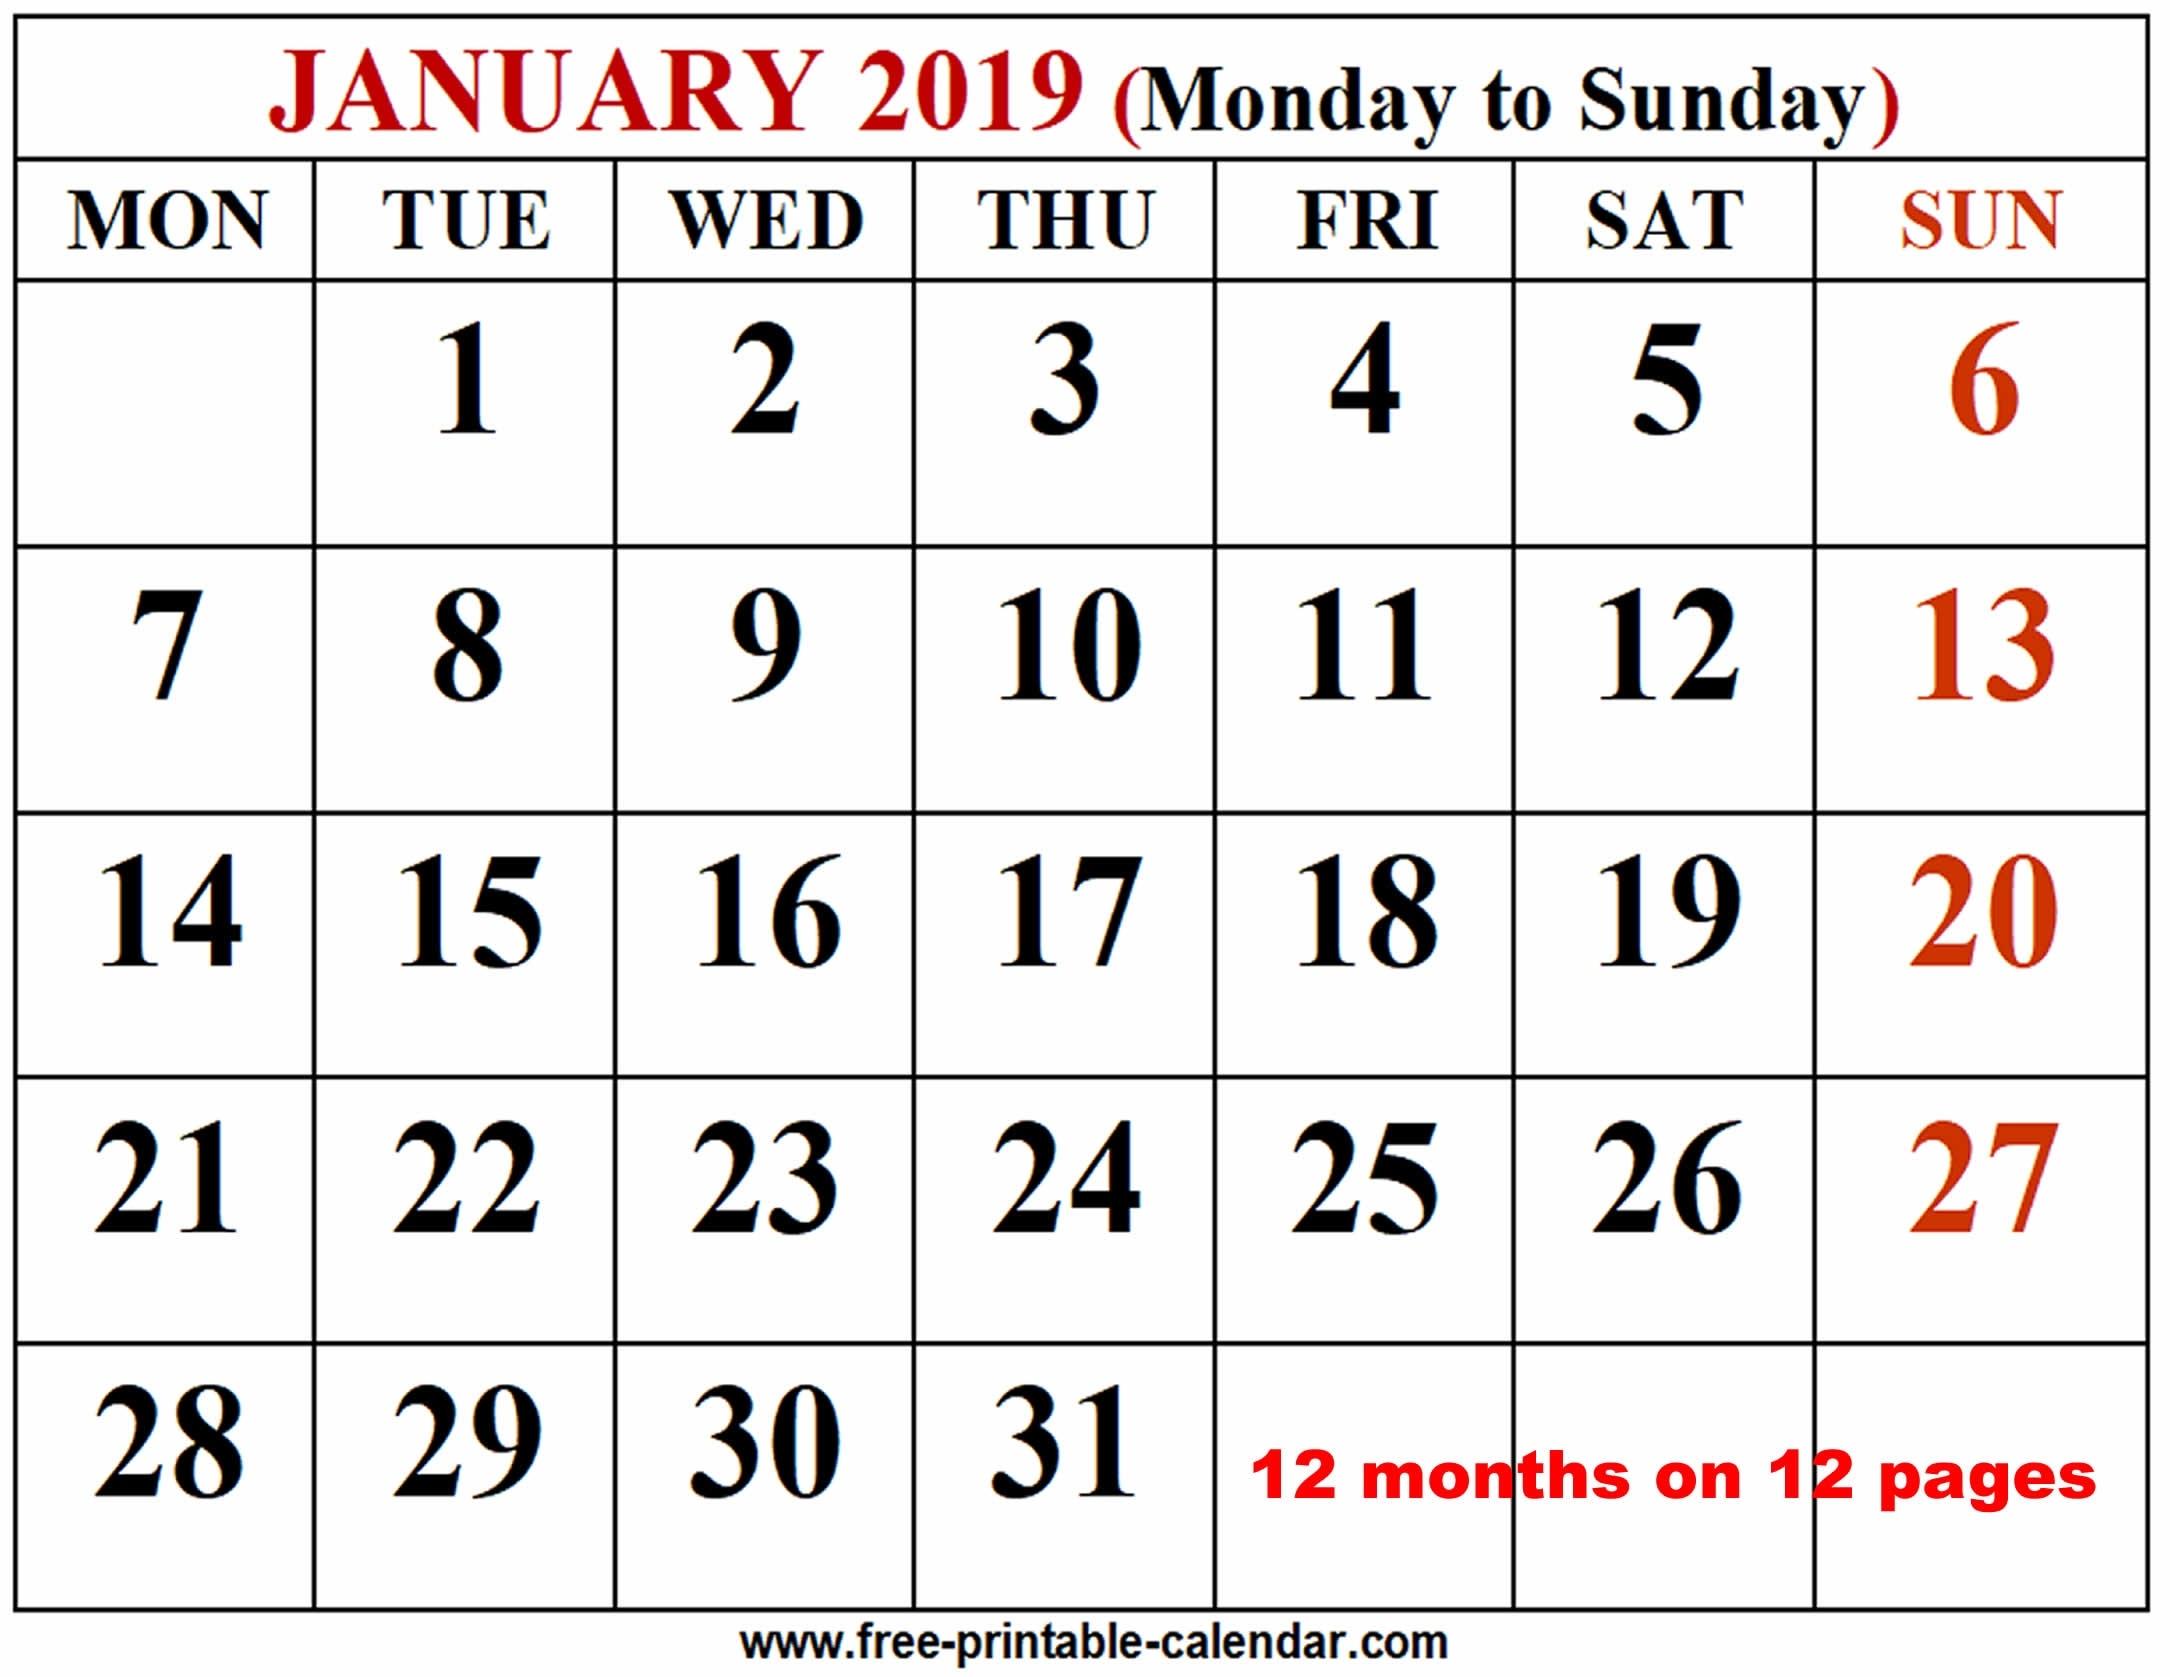 2019 Calendar Template - Free-Printable-Calendar Free Printable Calendar By Month